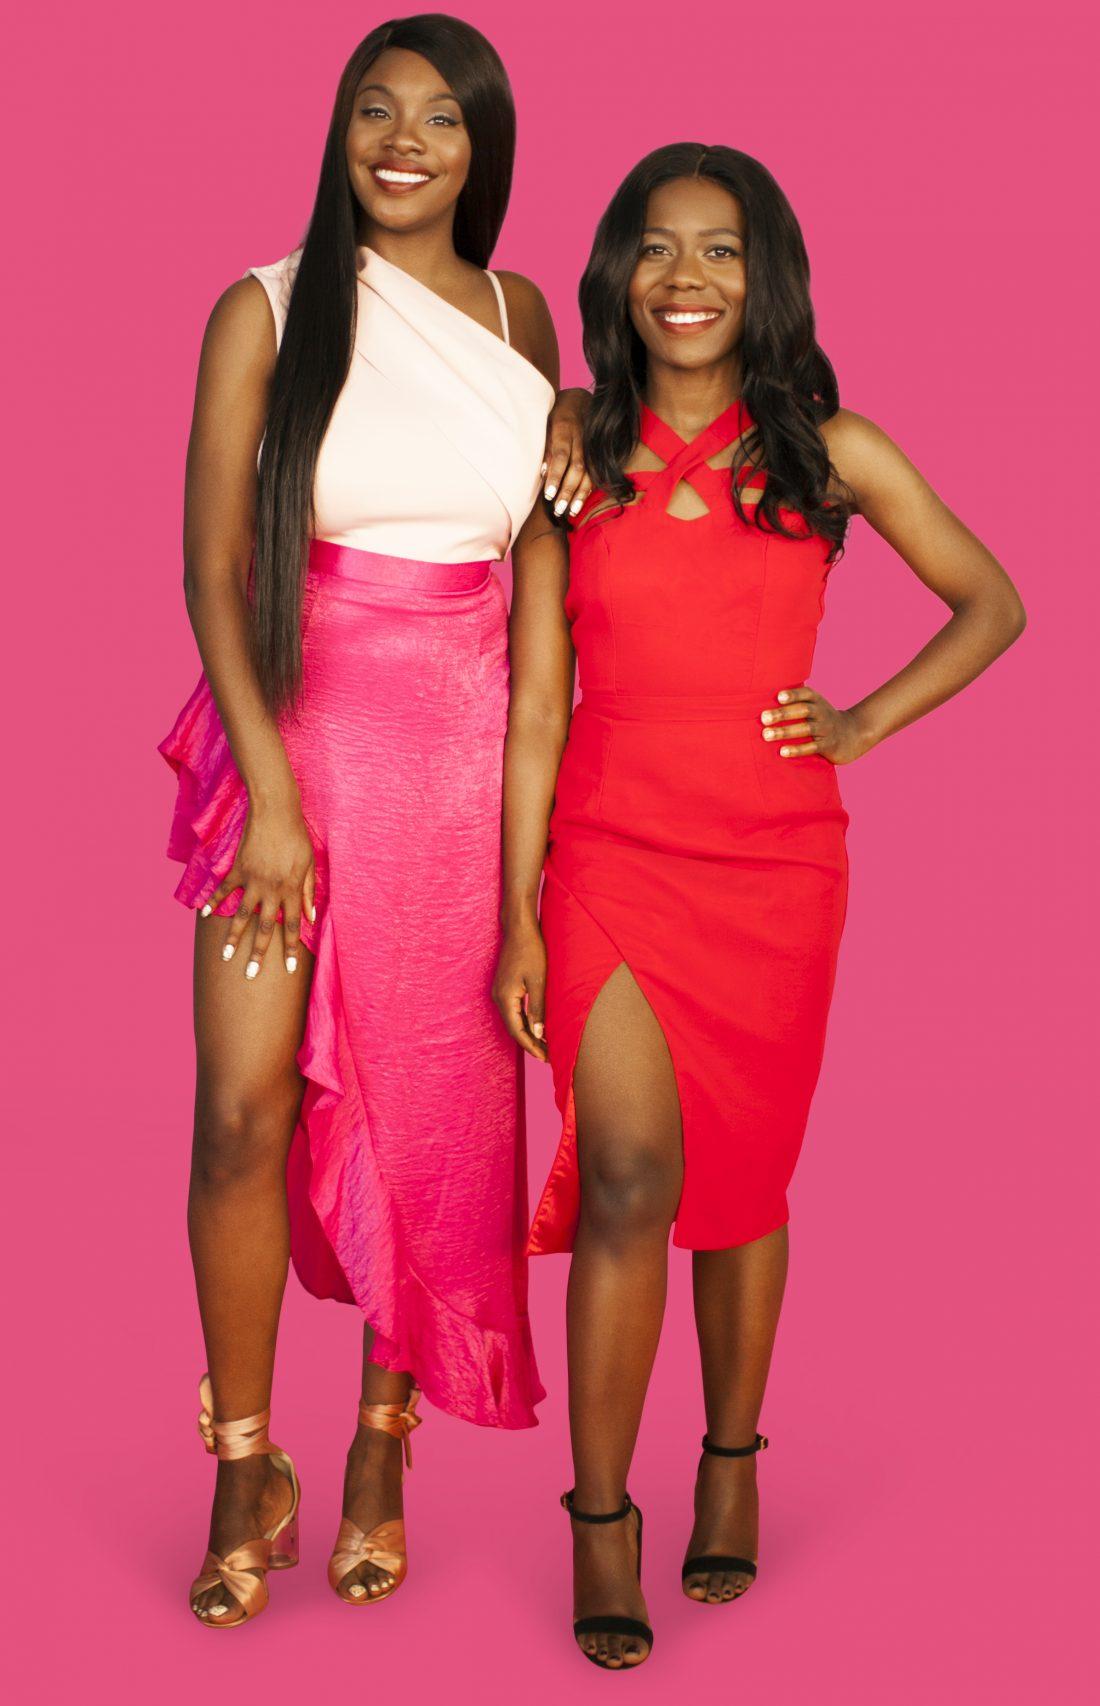 Melan Mag Interviews: Authors of Slay in Your Lane, Yomi Adegoke and Elizabeth Uviebinené